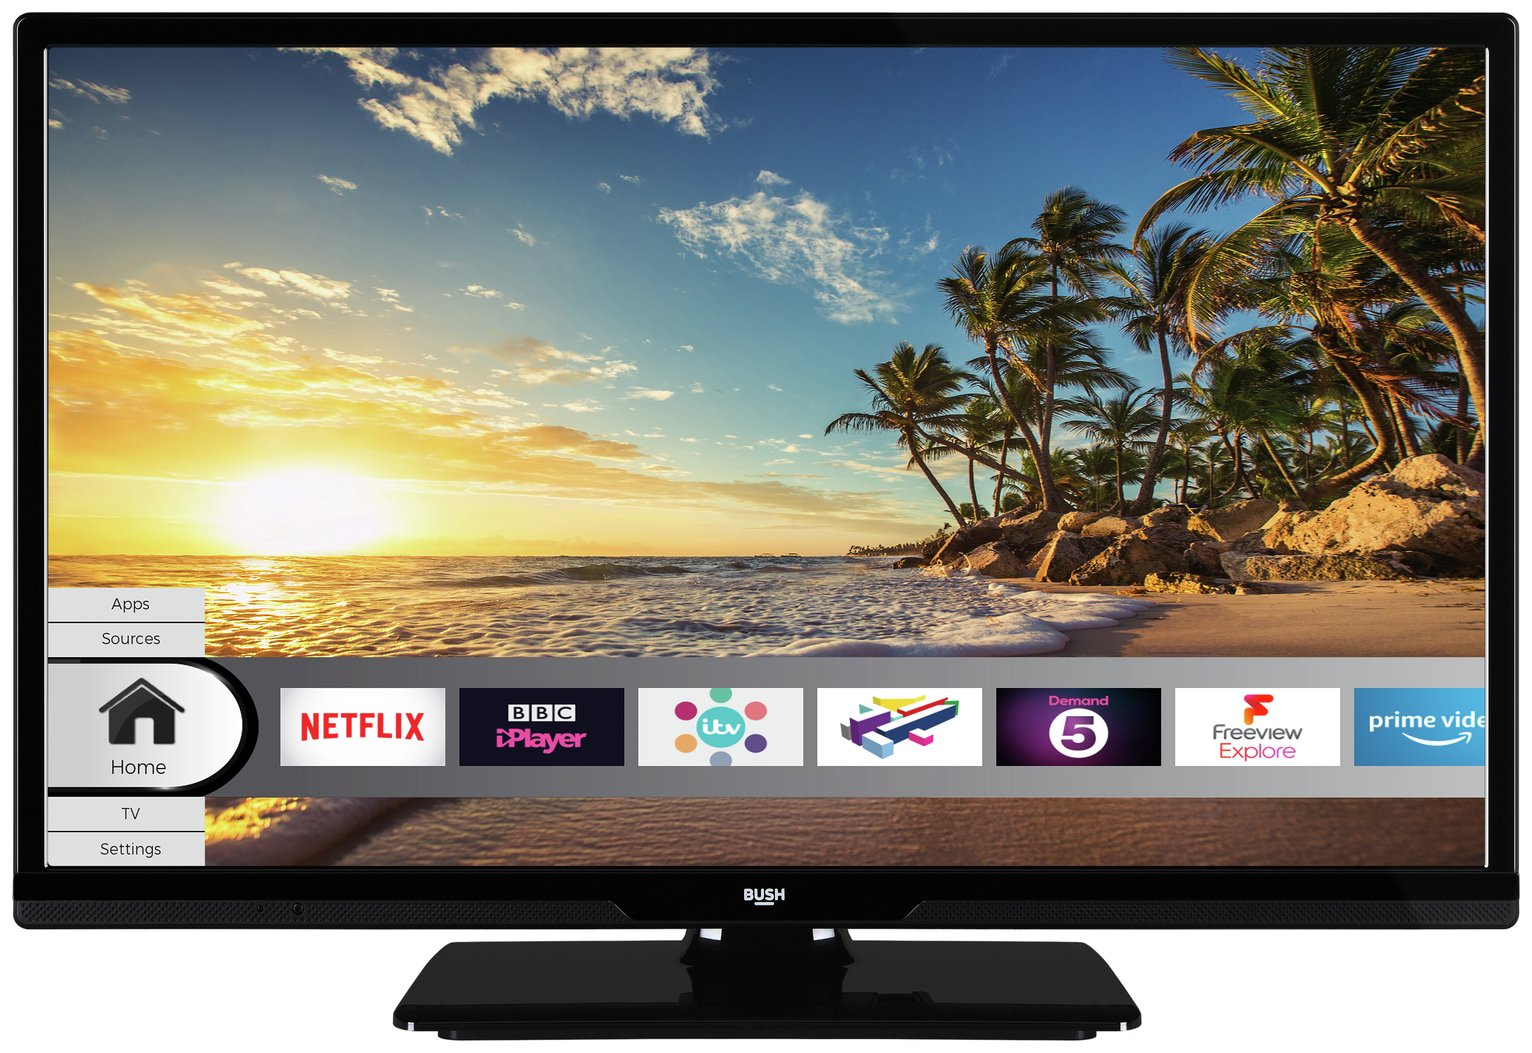 Bush 24 Inch Smart HD Ready TV / DVD Combi - Black